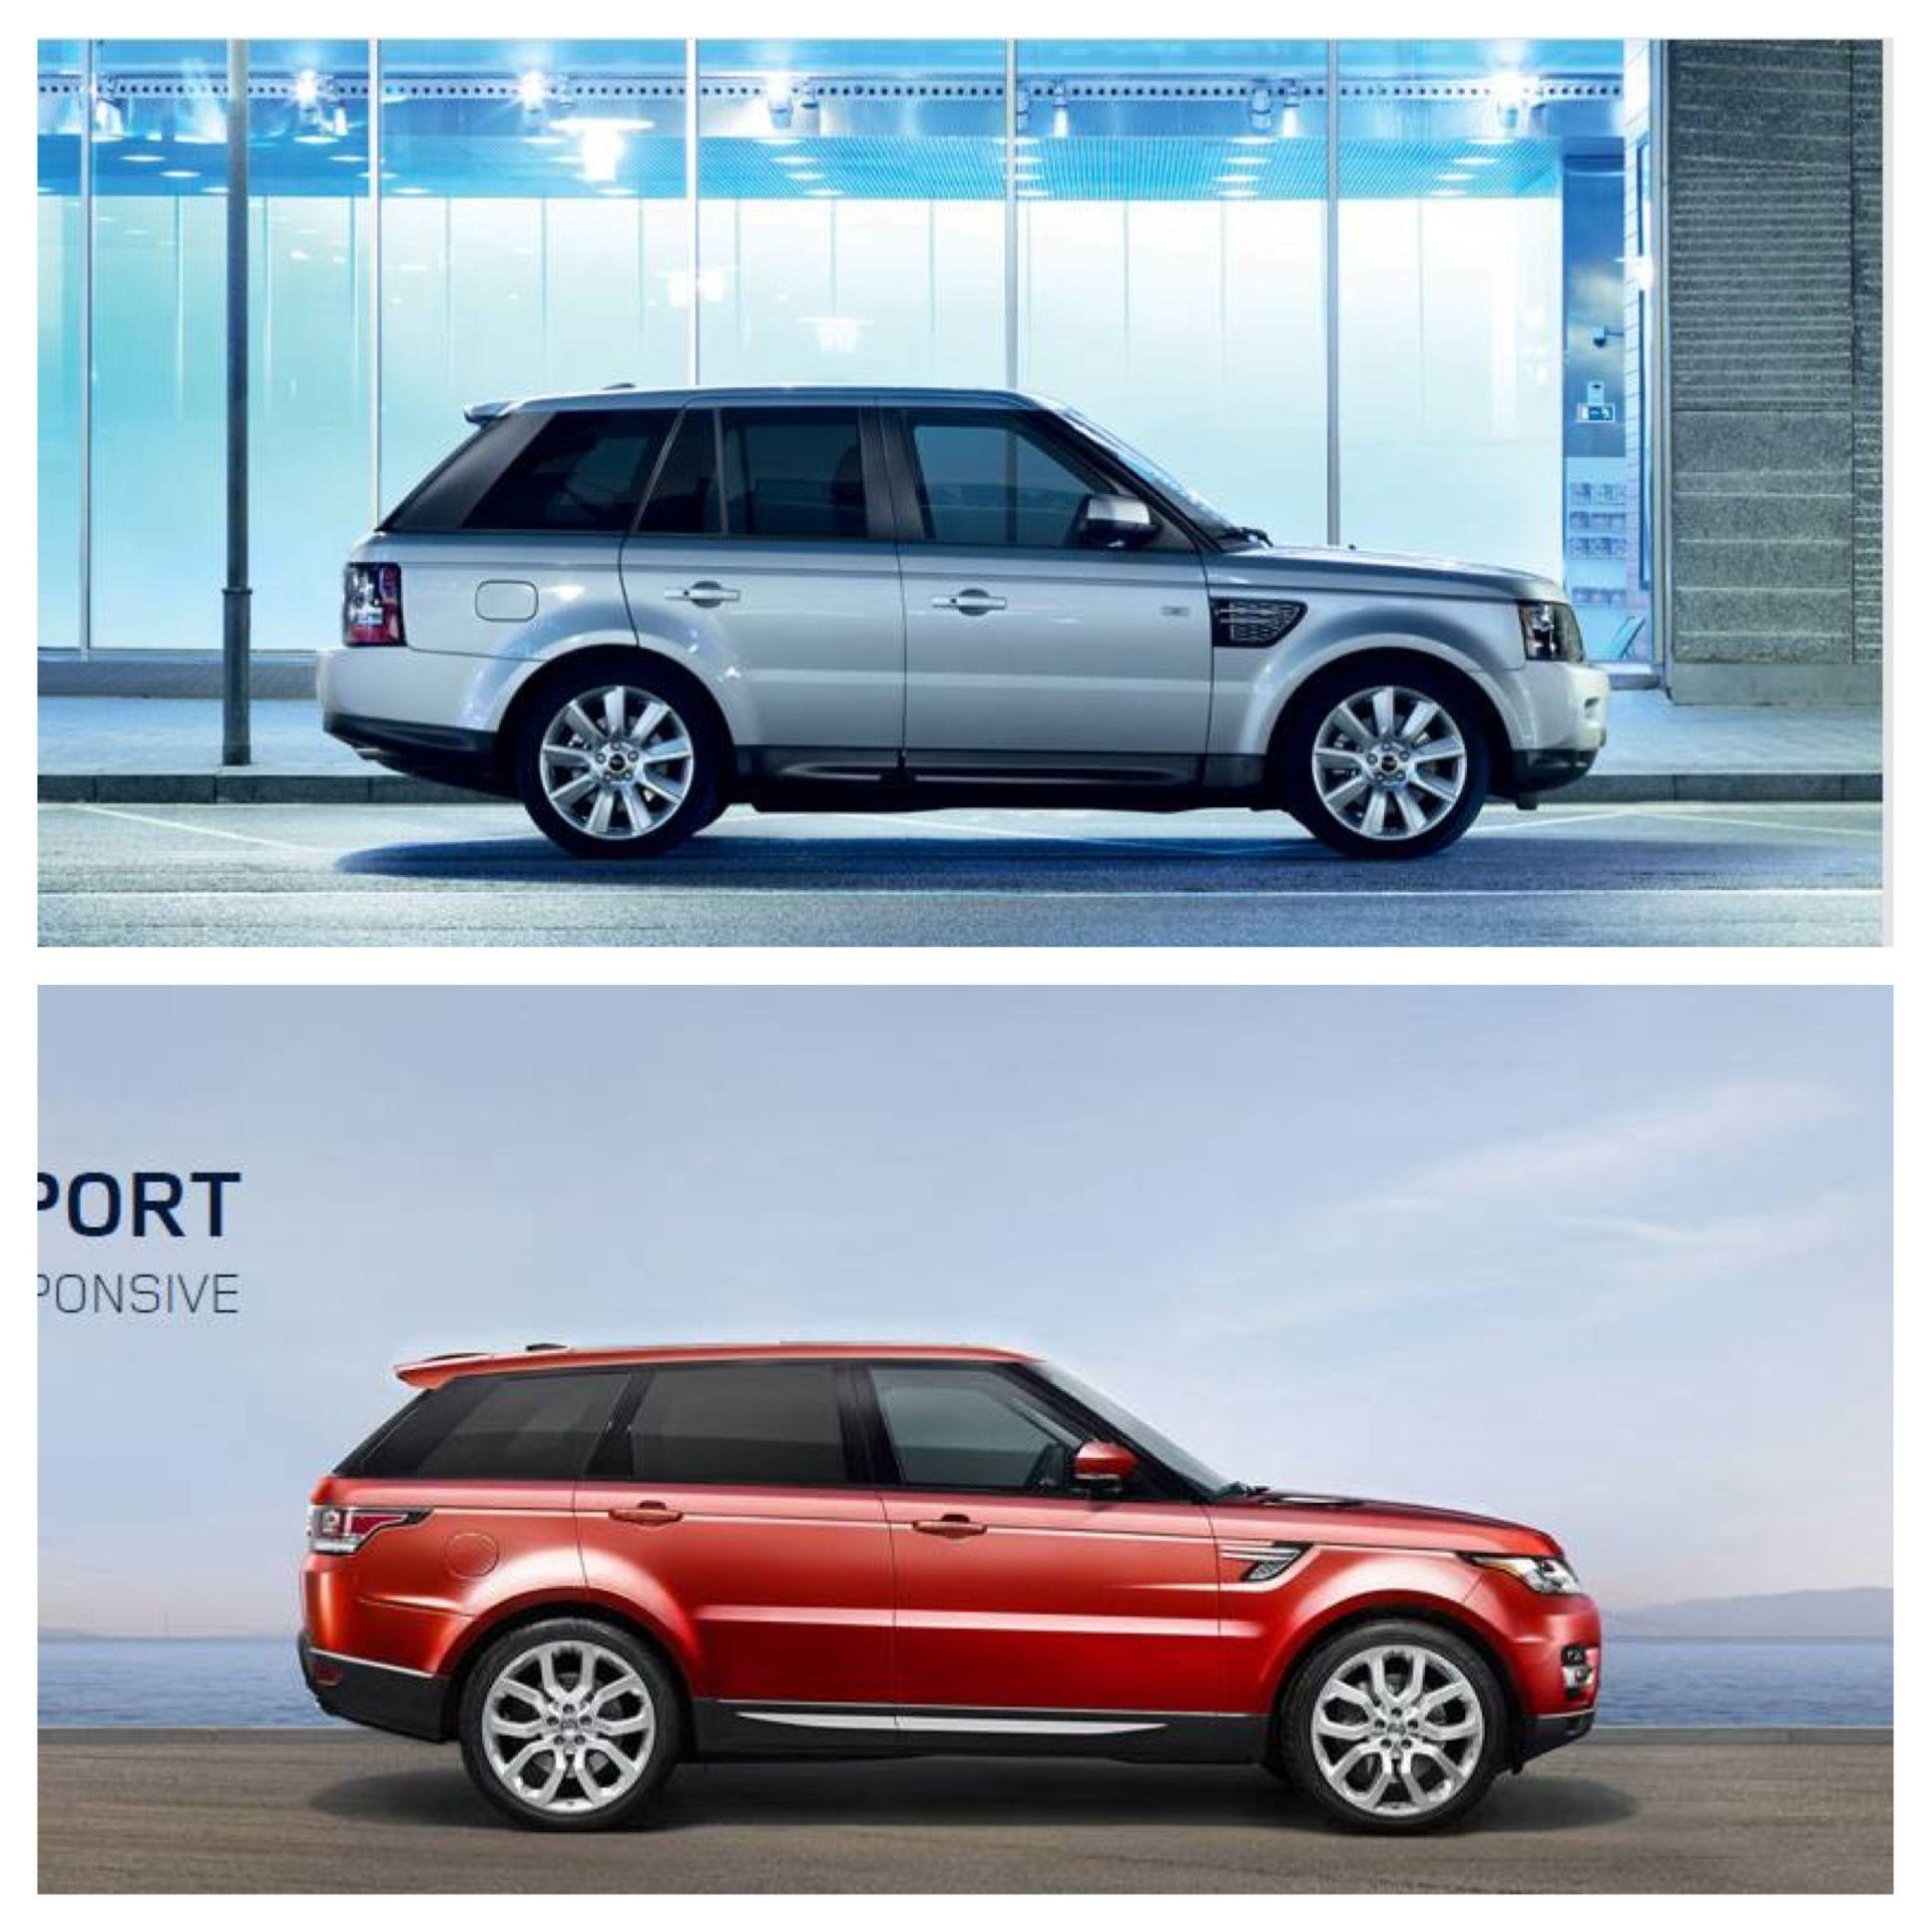 2013 Vs 2014 Range Rover Sport Range Rover Sport 2014 Range Rover Sport Range Rover Black